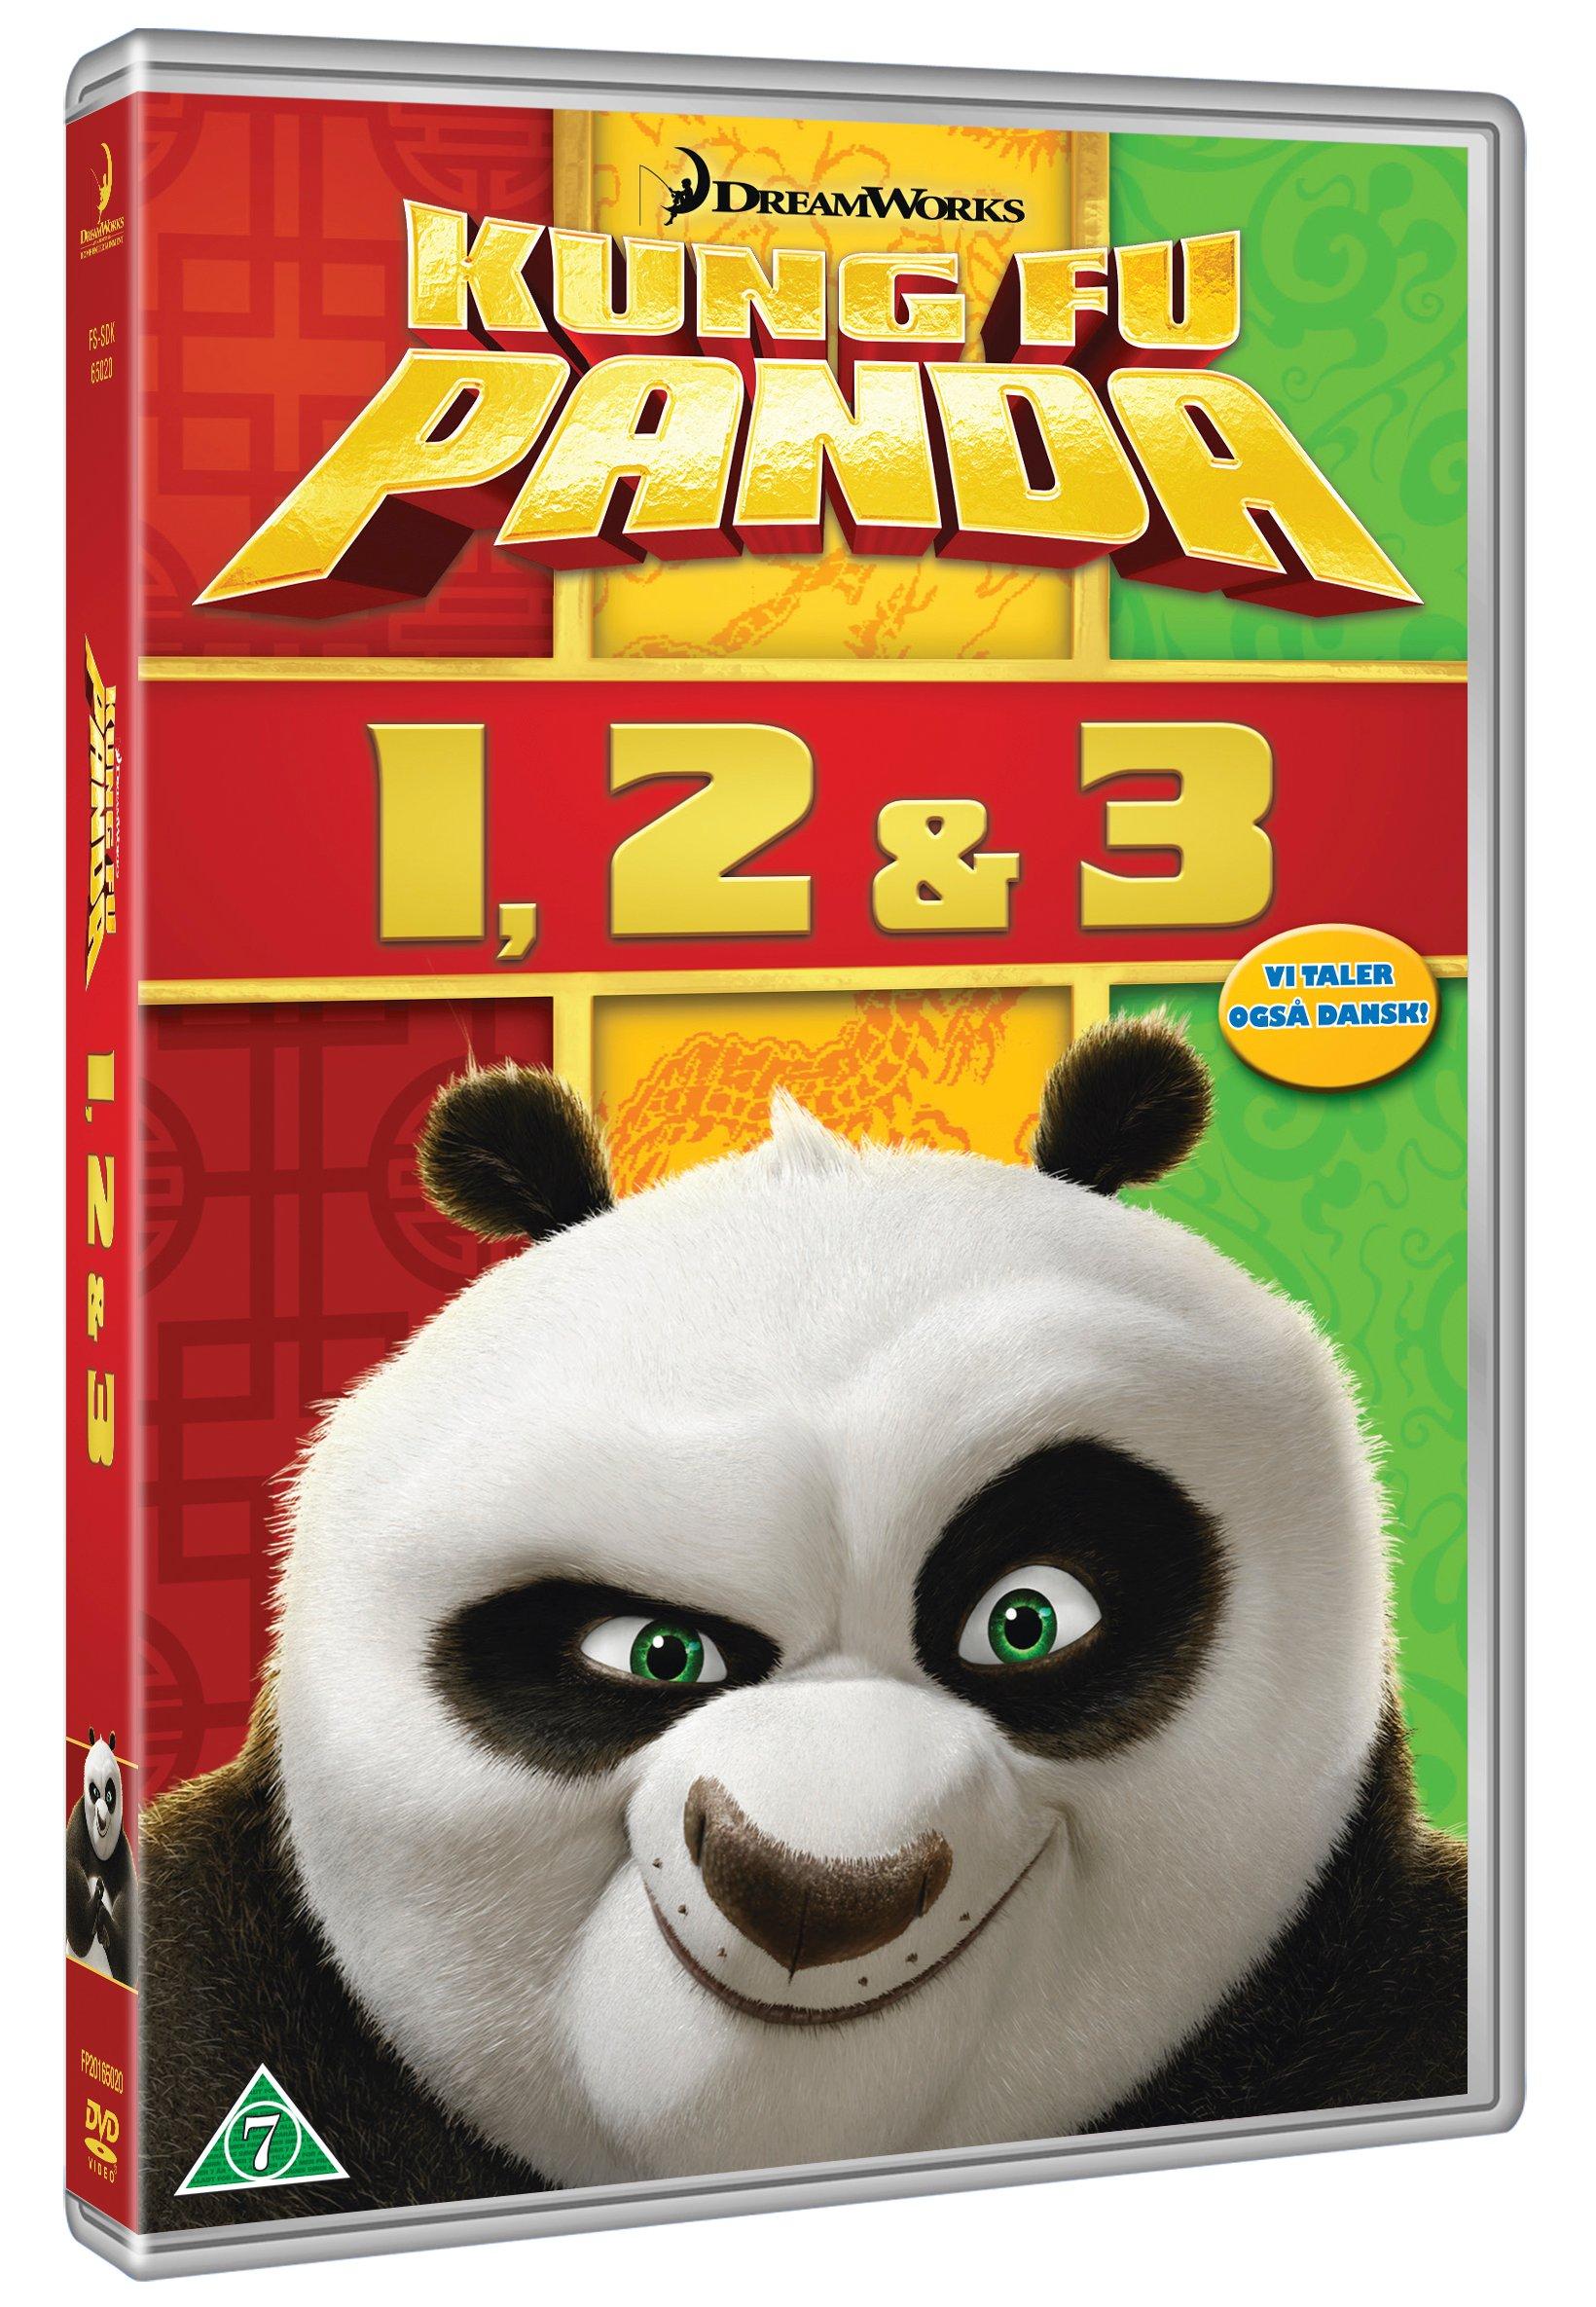 Buy Kung Fu Panda 1-3 Boxset - DVD - Standard - DVD - Incl ...